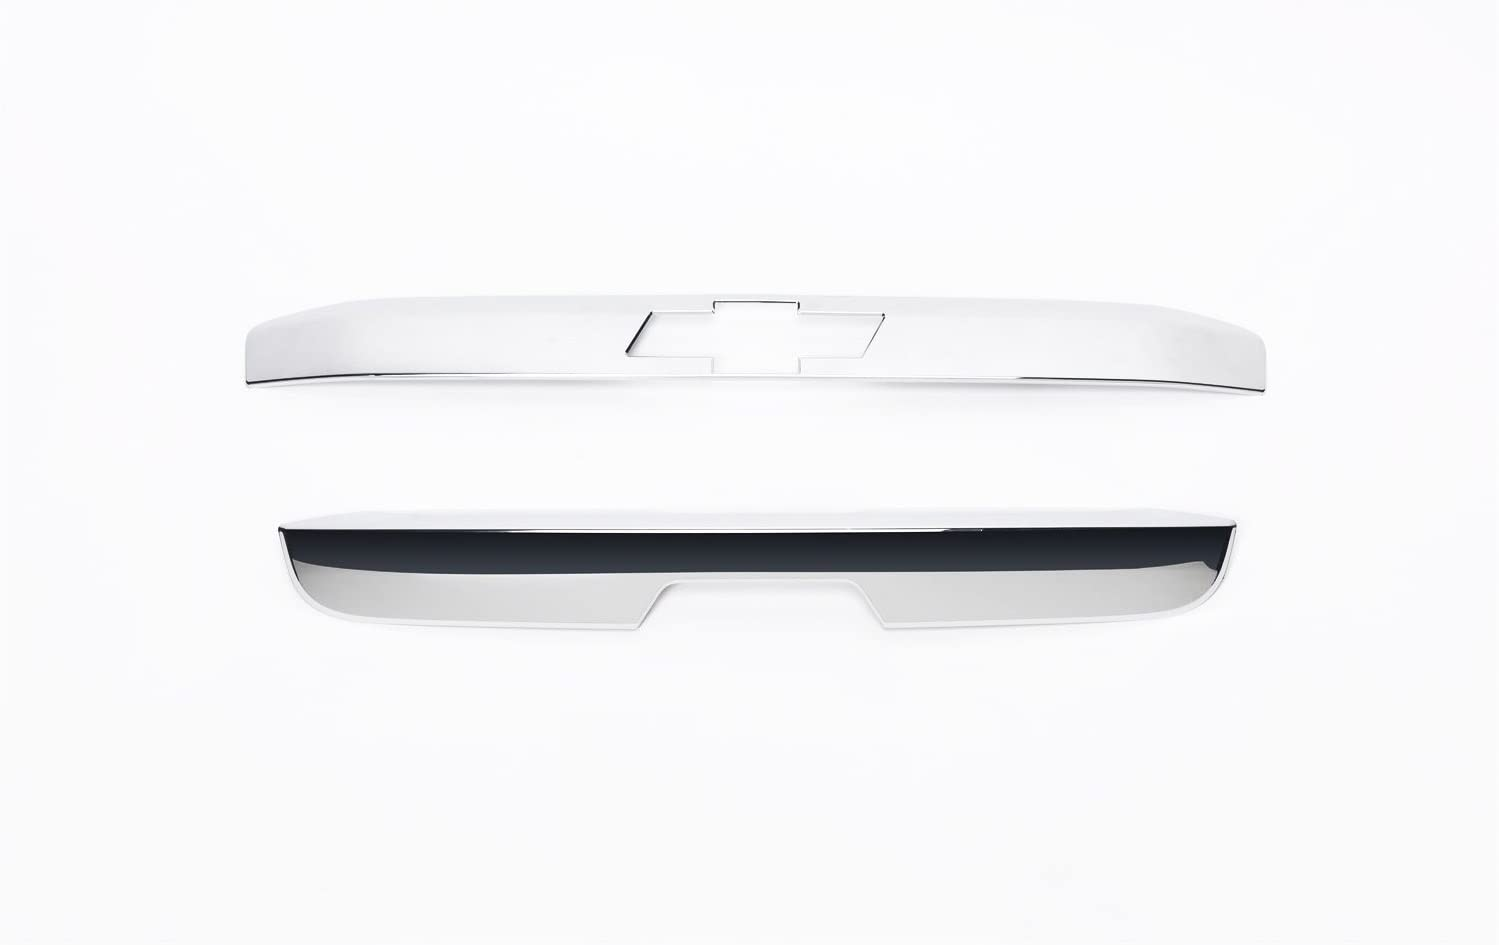 Putco 400044 Chrome Rear Hatch Cover 在庫限り 返品送料無料 Piece 2 Handle -